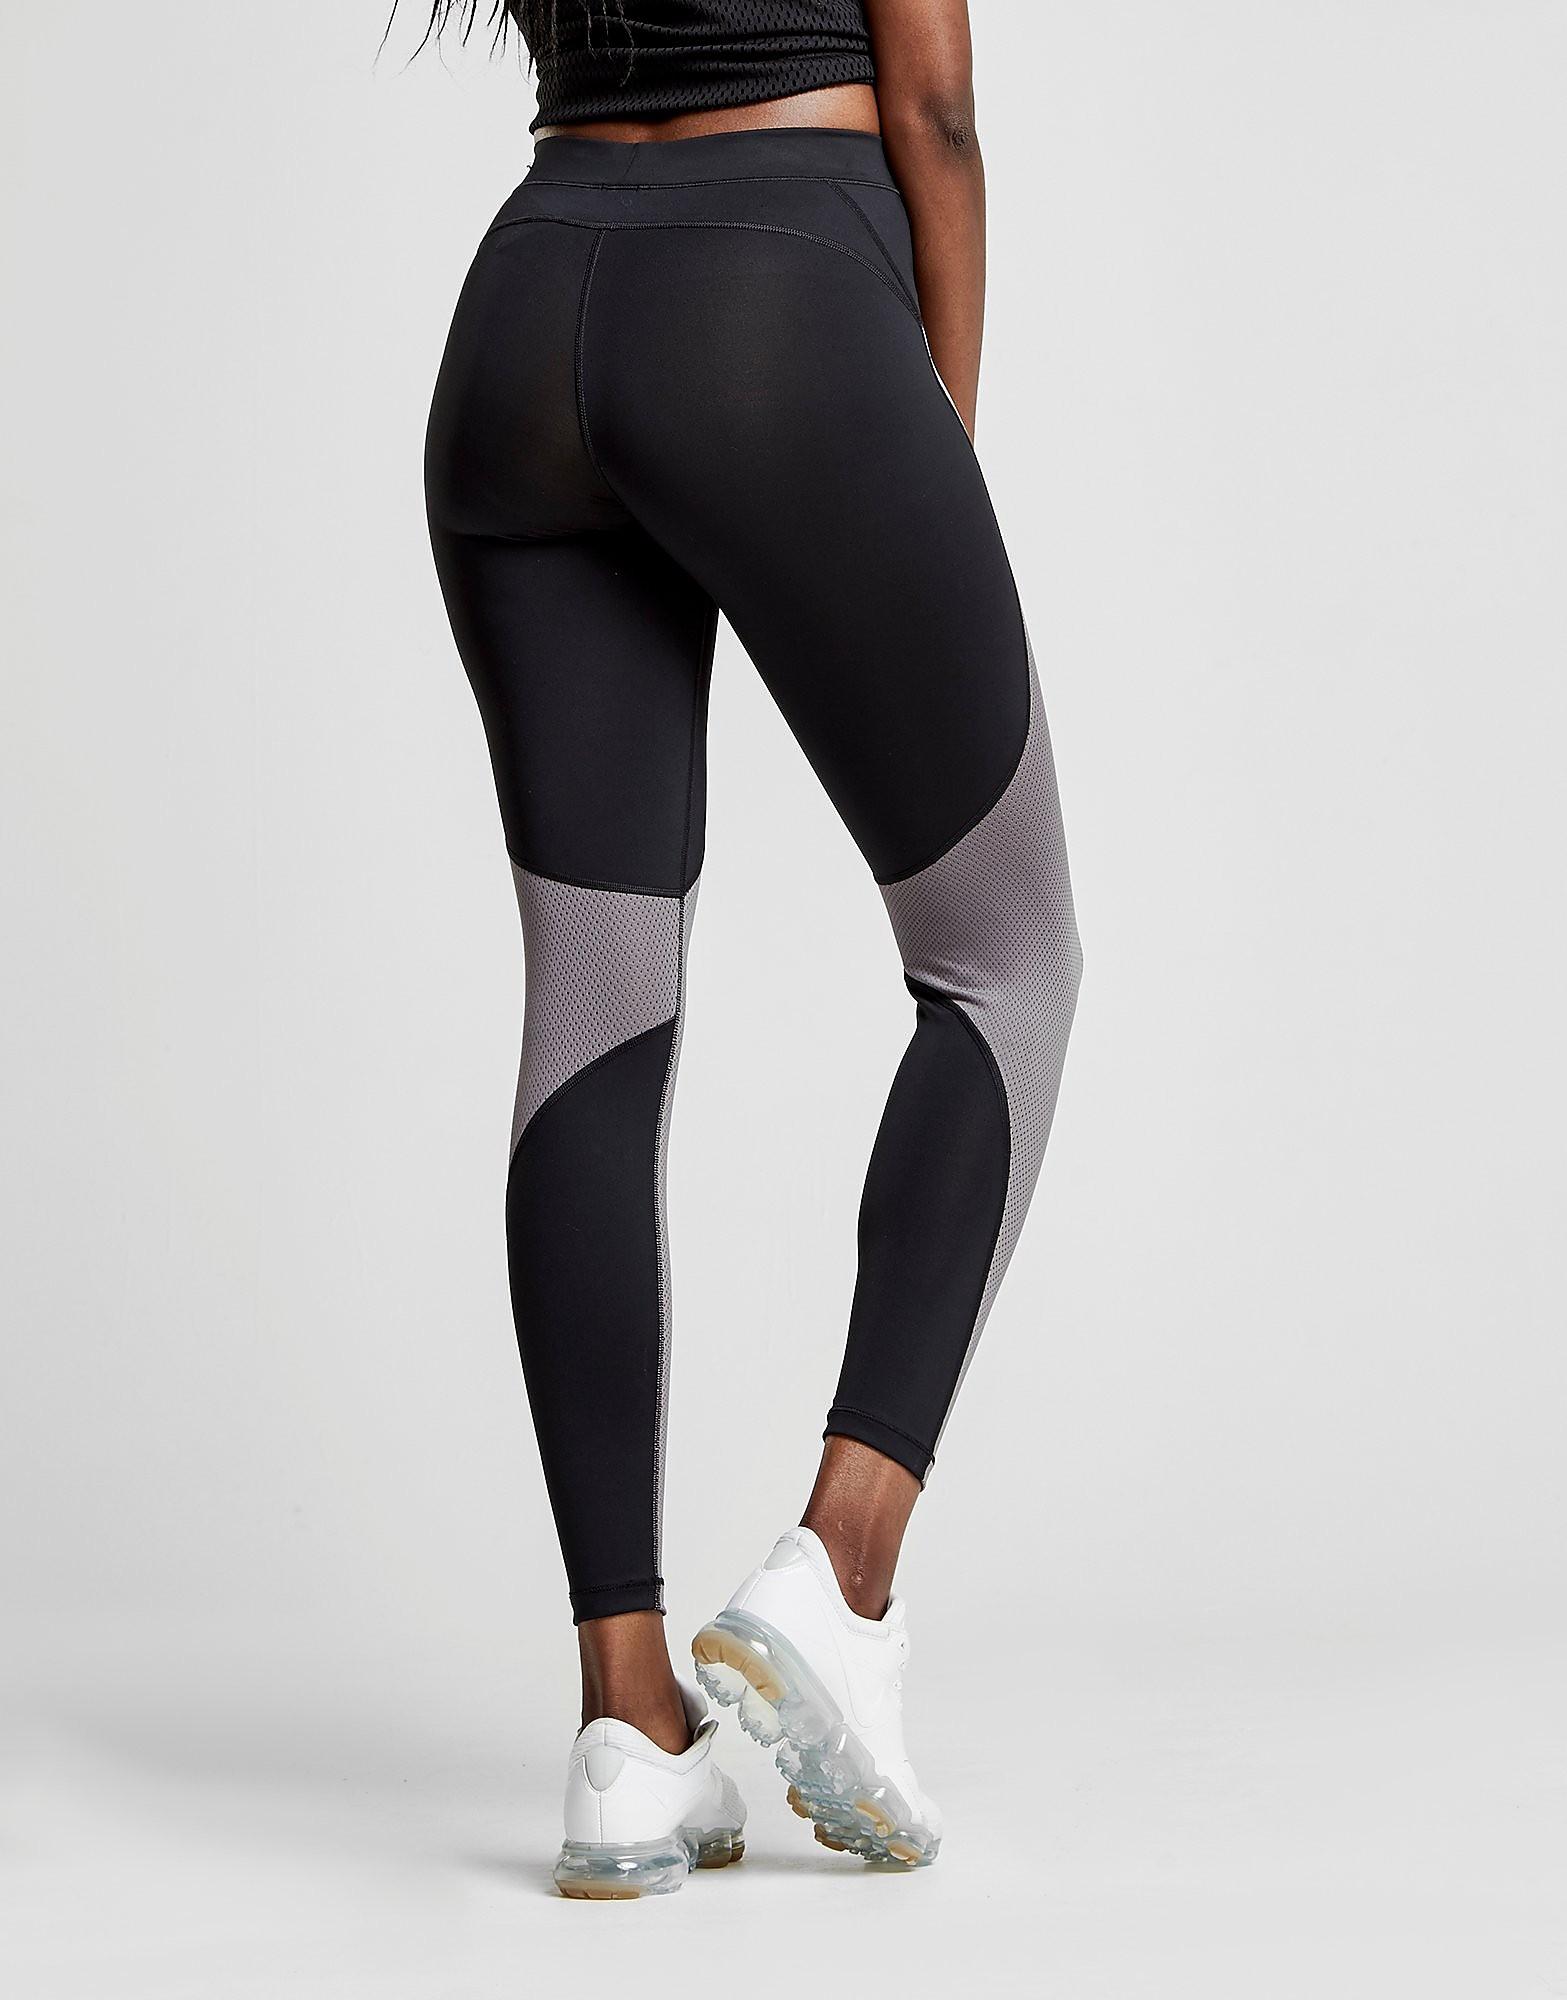 Nike Legging Pro Training Hypercool Mesh Femme